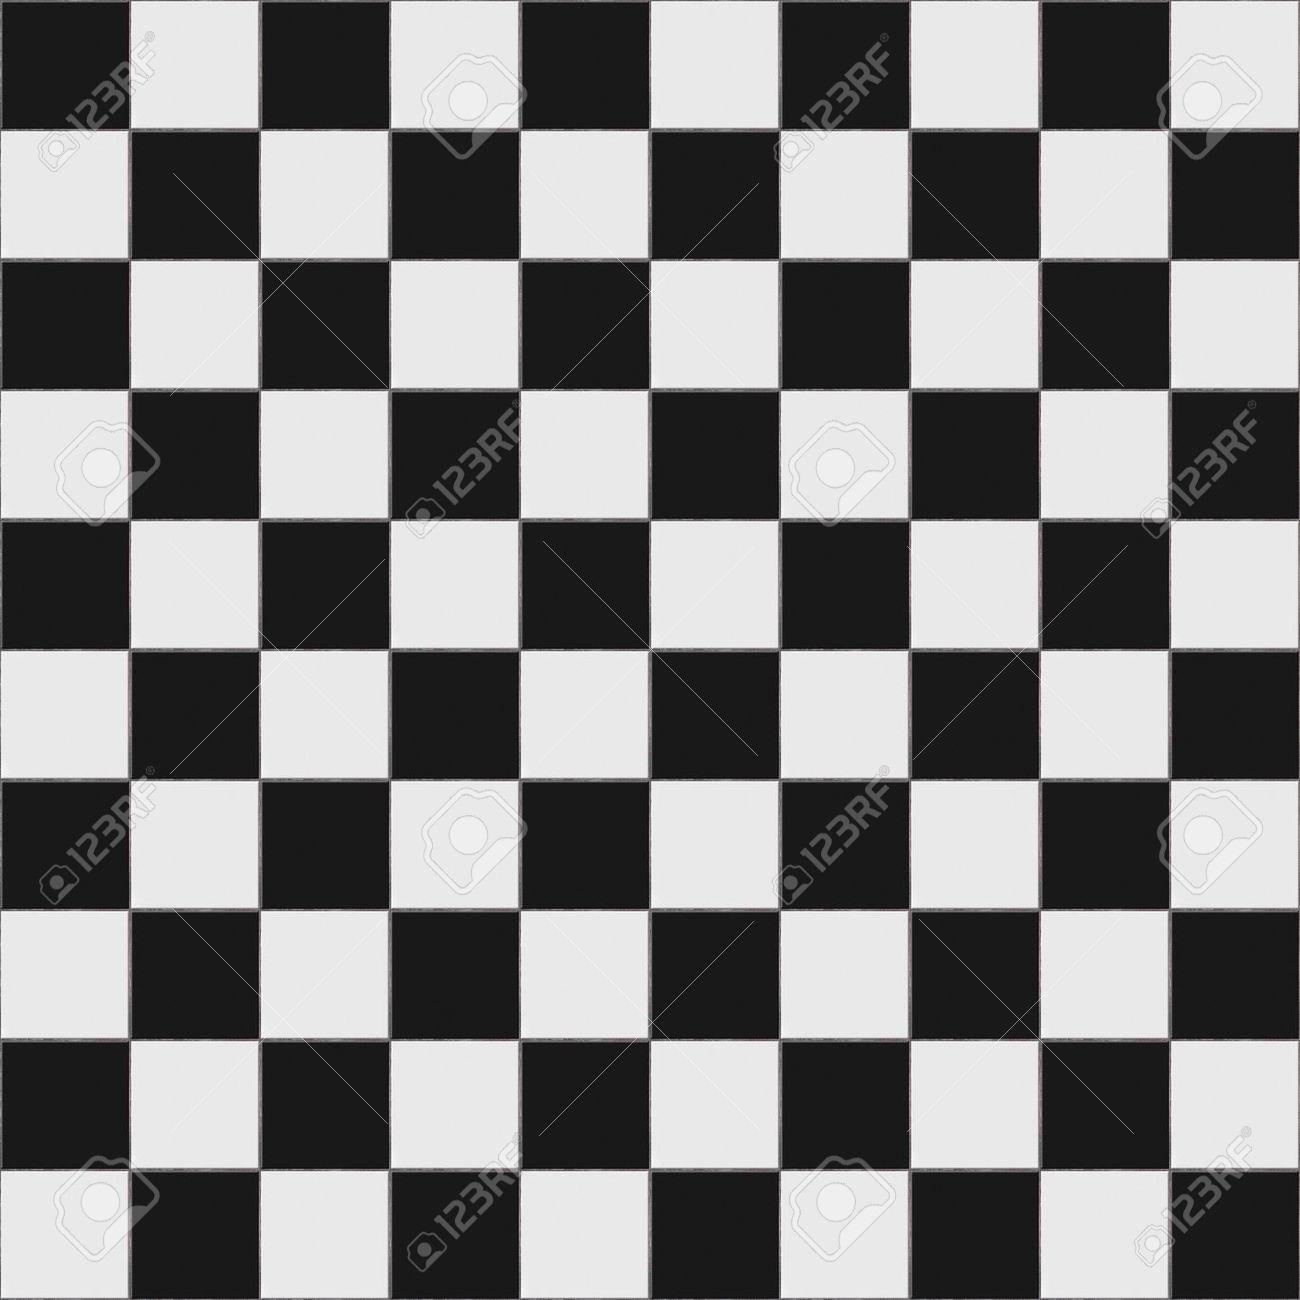 Black Floor Texture 25 Wood Floor Backgrounds Freecreatives Black. Black And White Tile Floor Texture